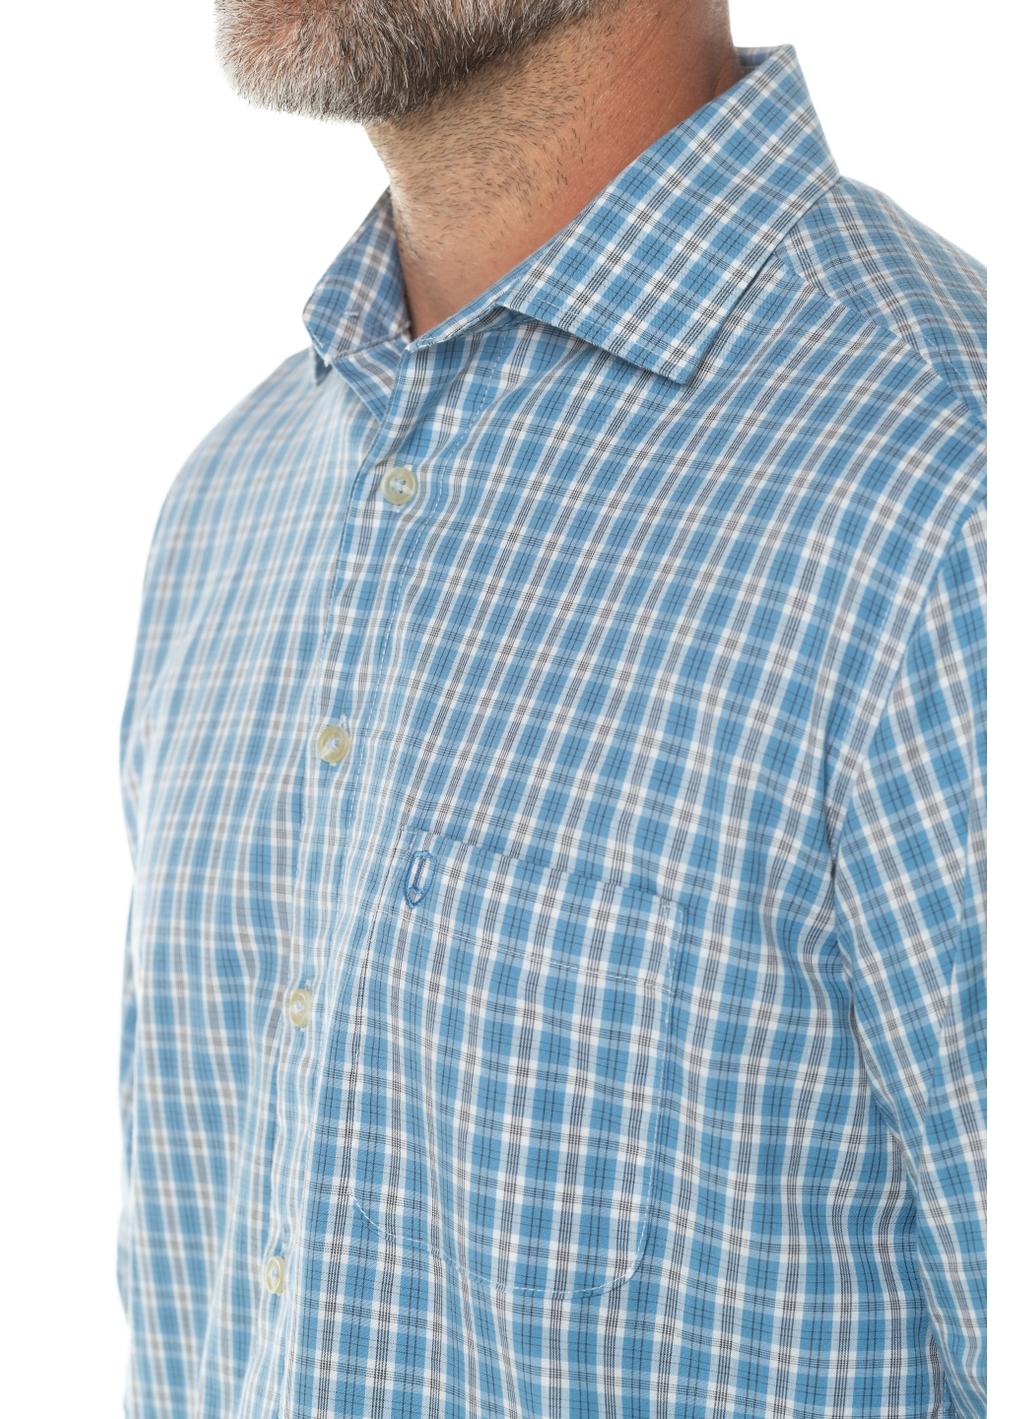 Travis Long Sleeve Shirt in Light Blue